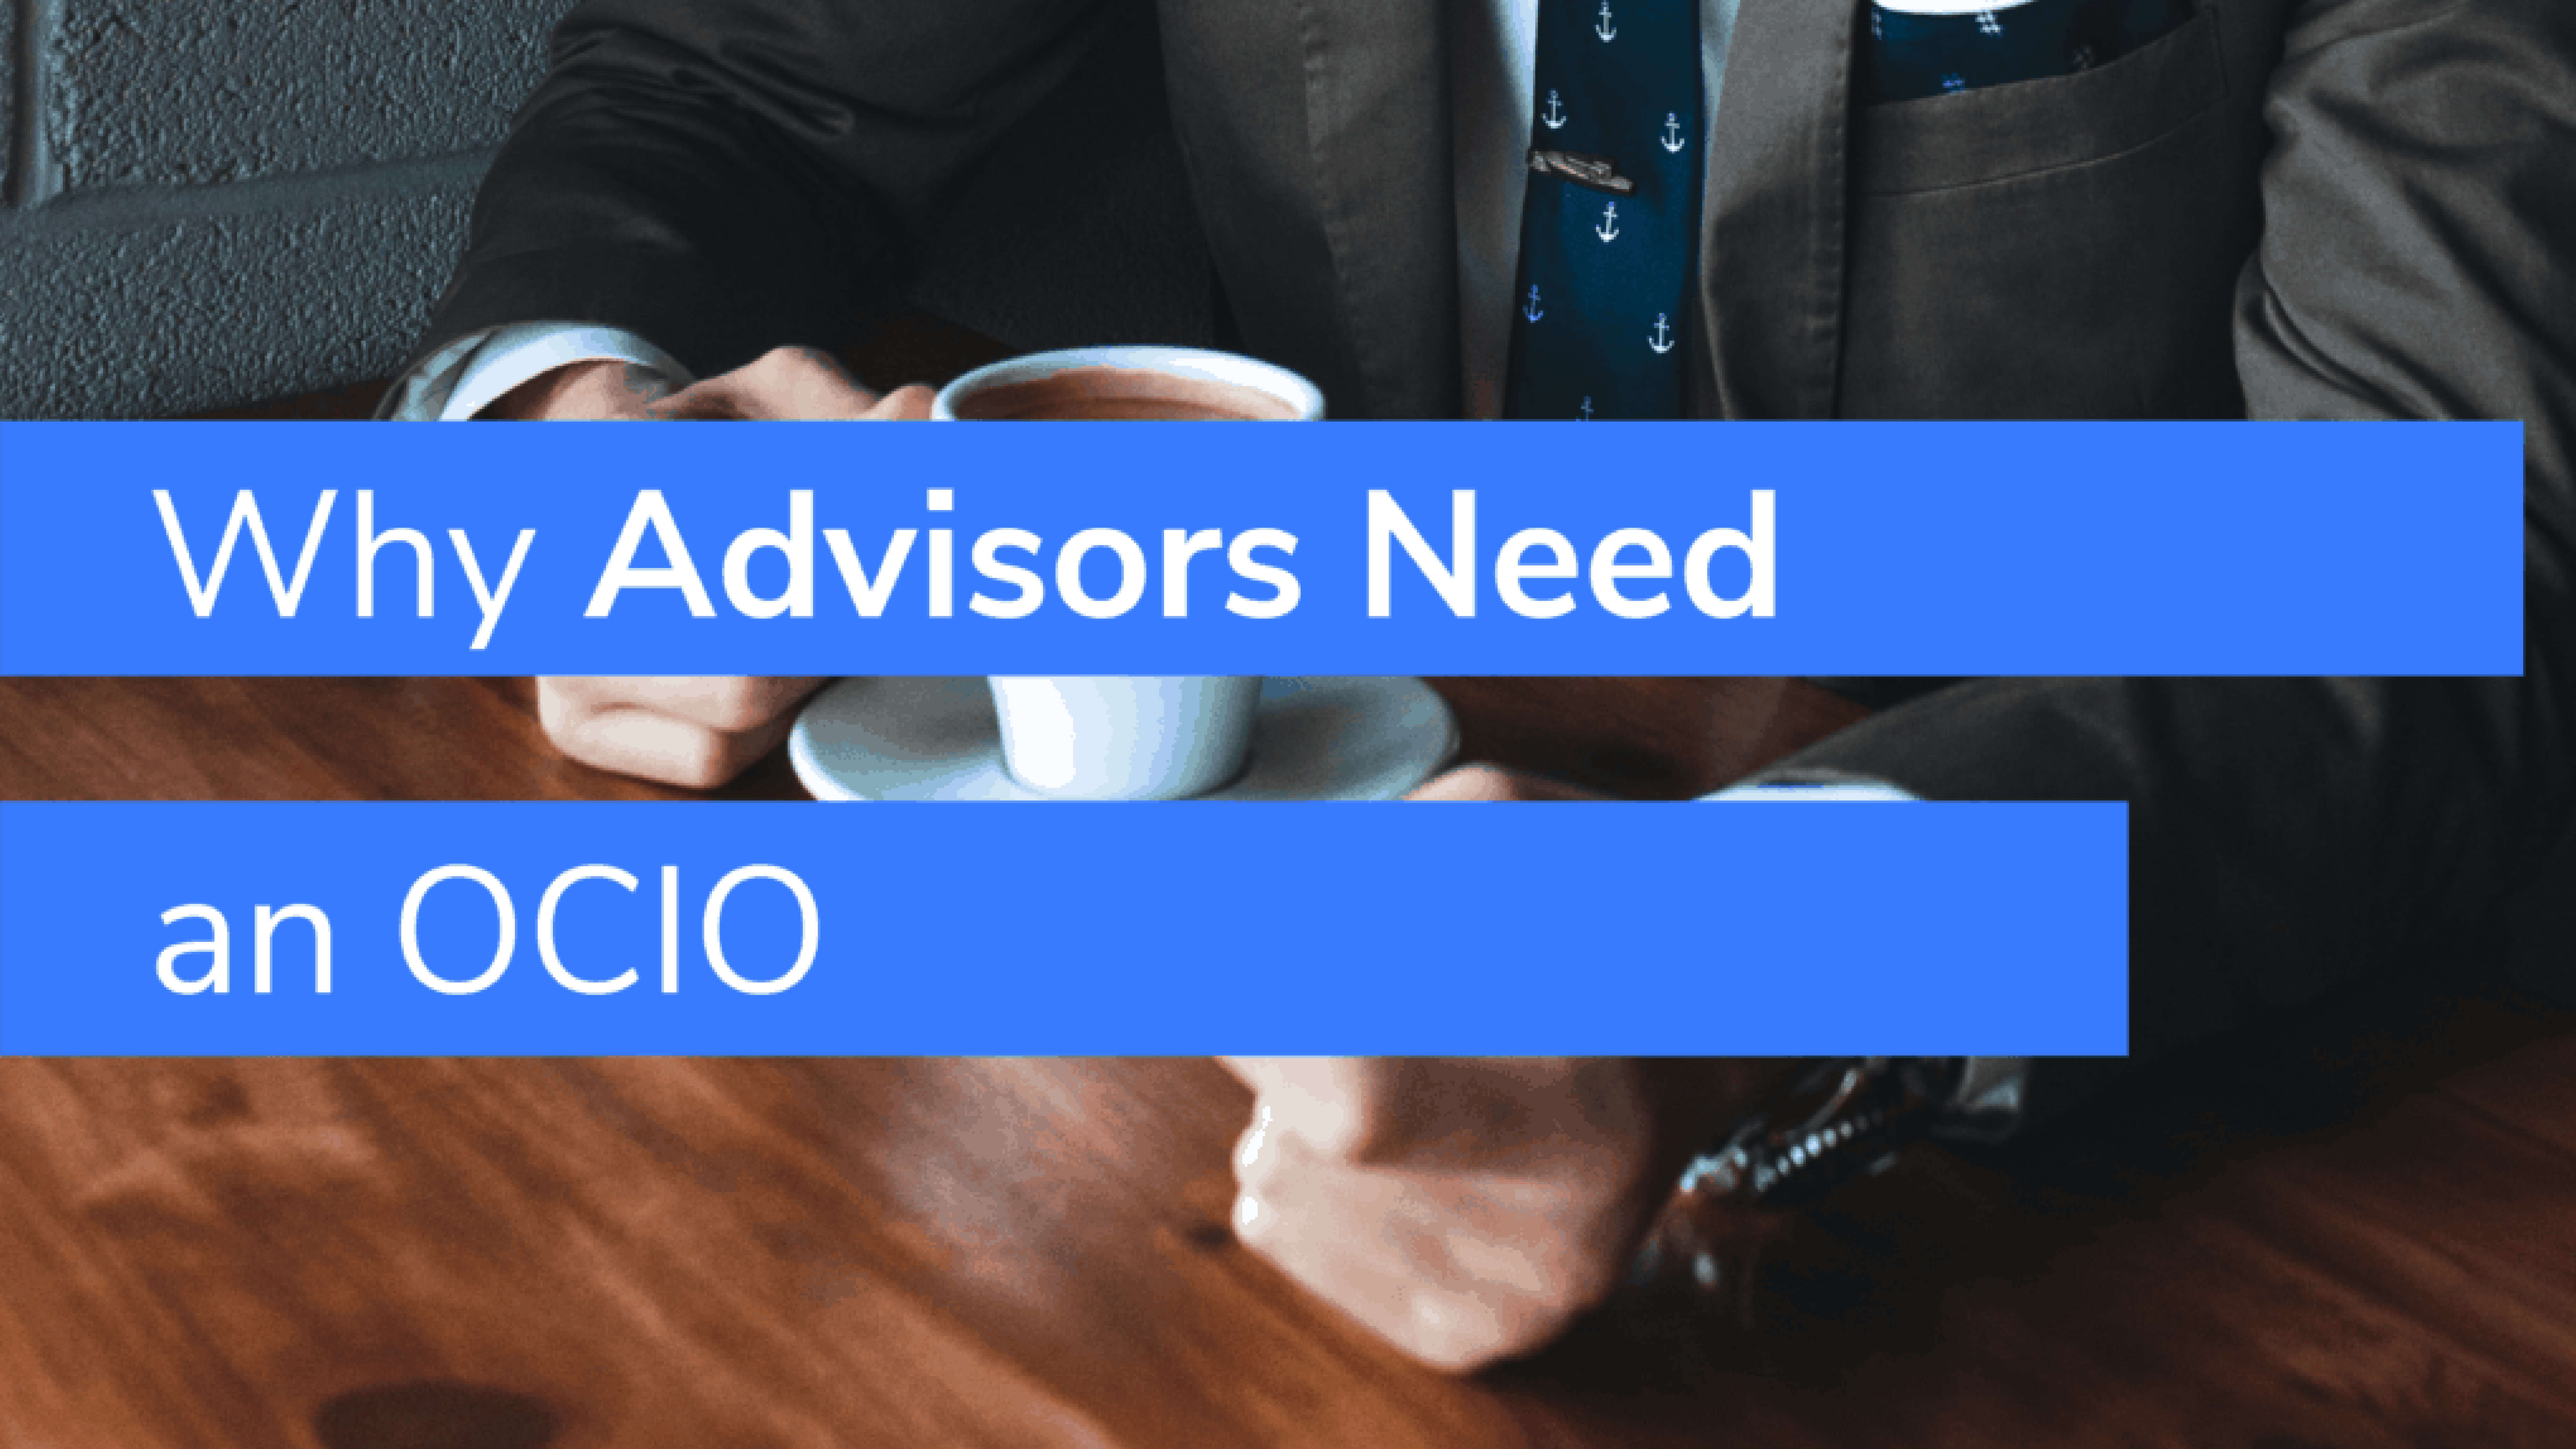 Why Advisors Need an OCIO